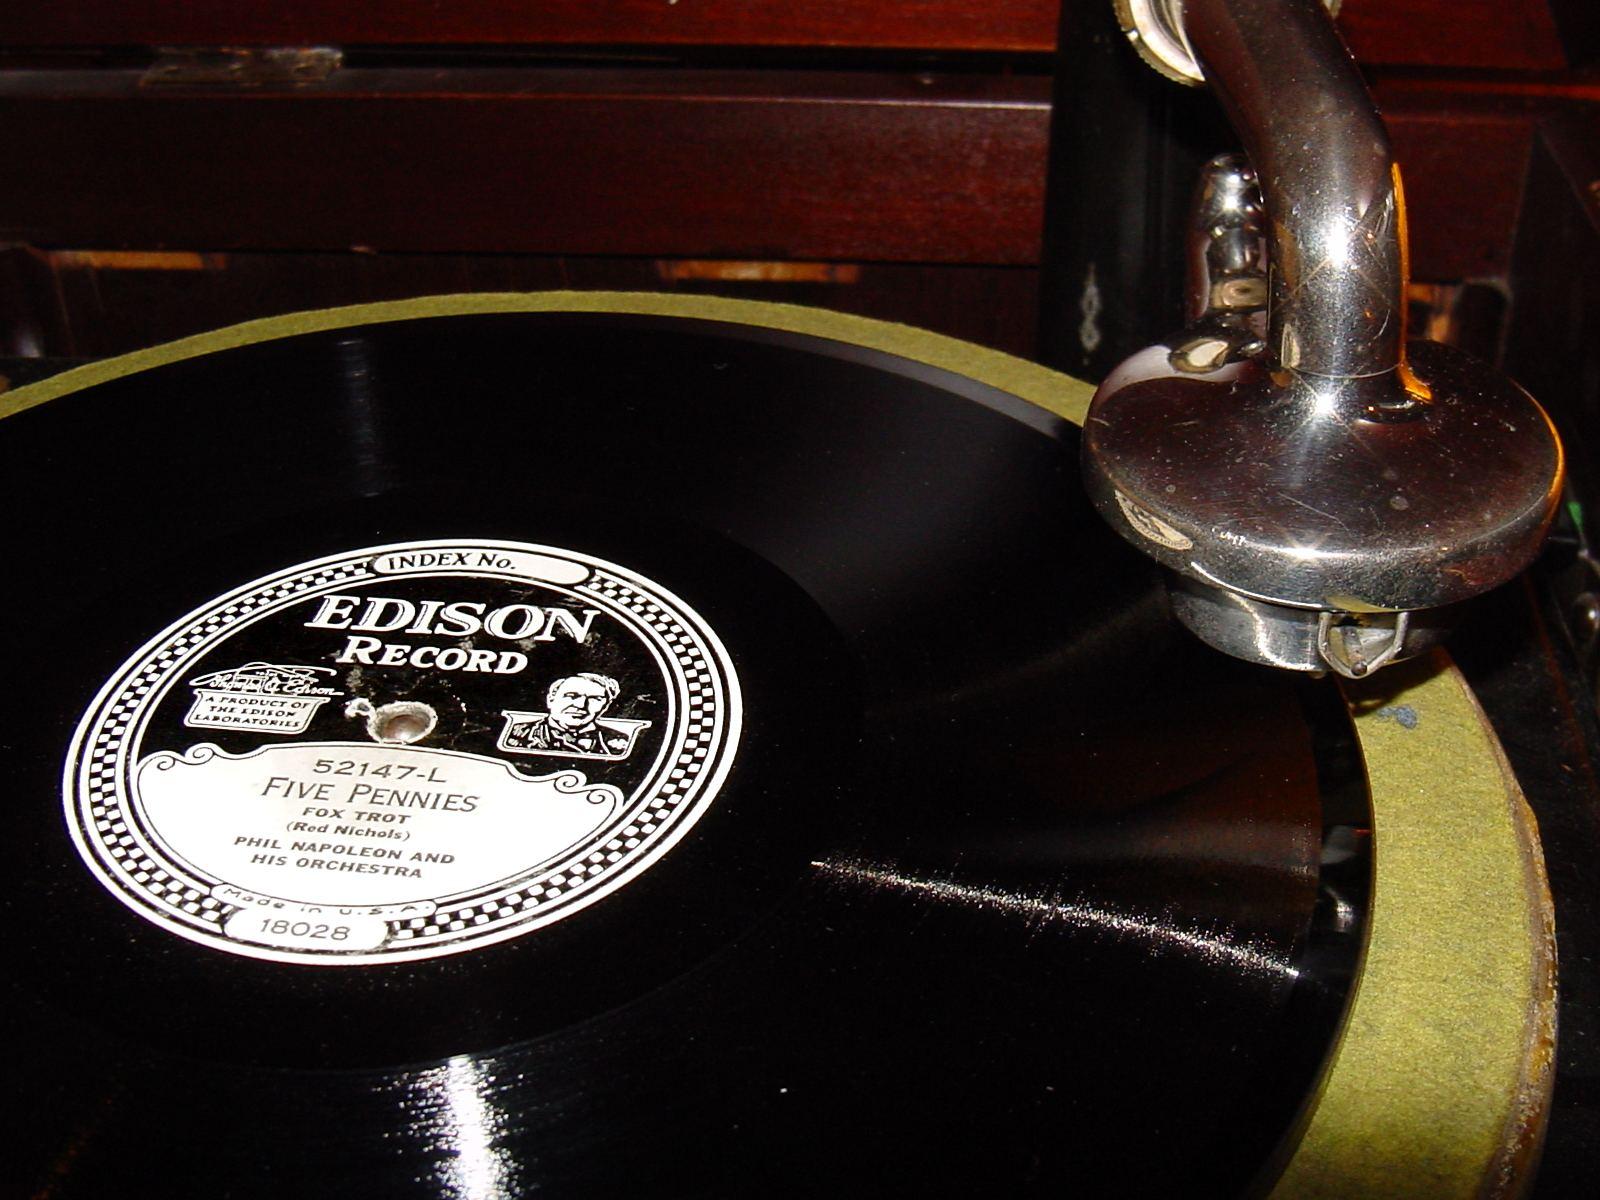 Dating edison records